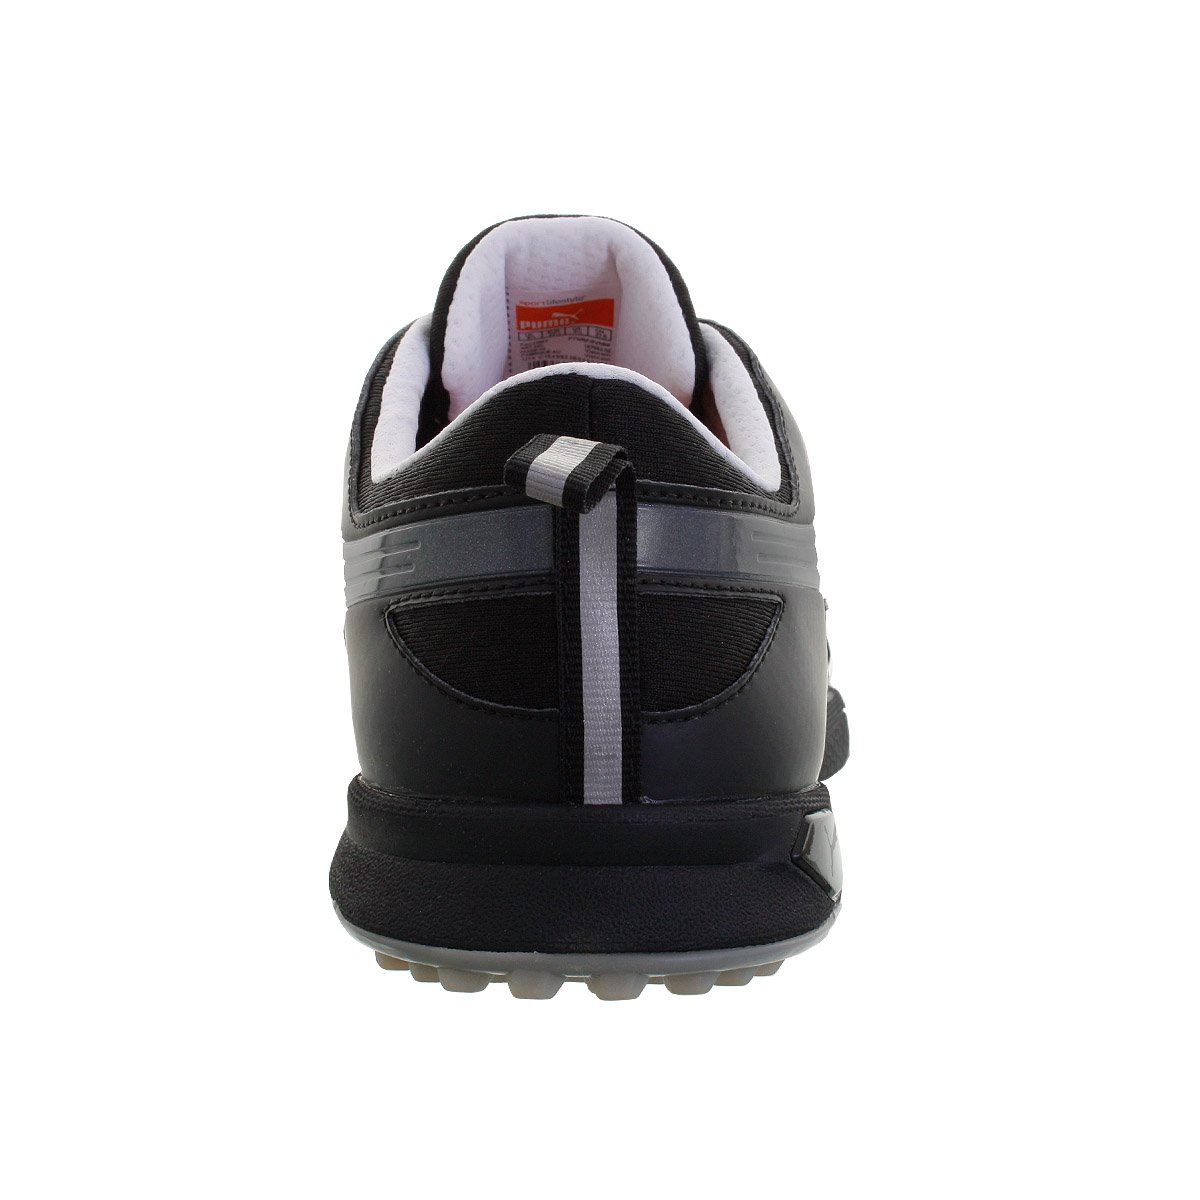 fe09e271bd85b7 Puma Golf 2015 Mens Biofly Mesh Golf Shoes - Black Puma Silver - UK 7.5   Amazon.co.uk  Sports   Outdoors